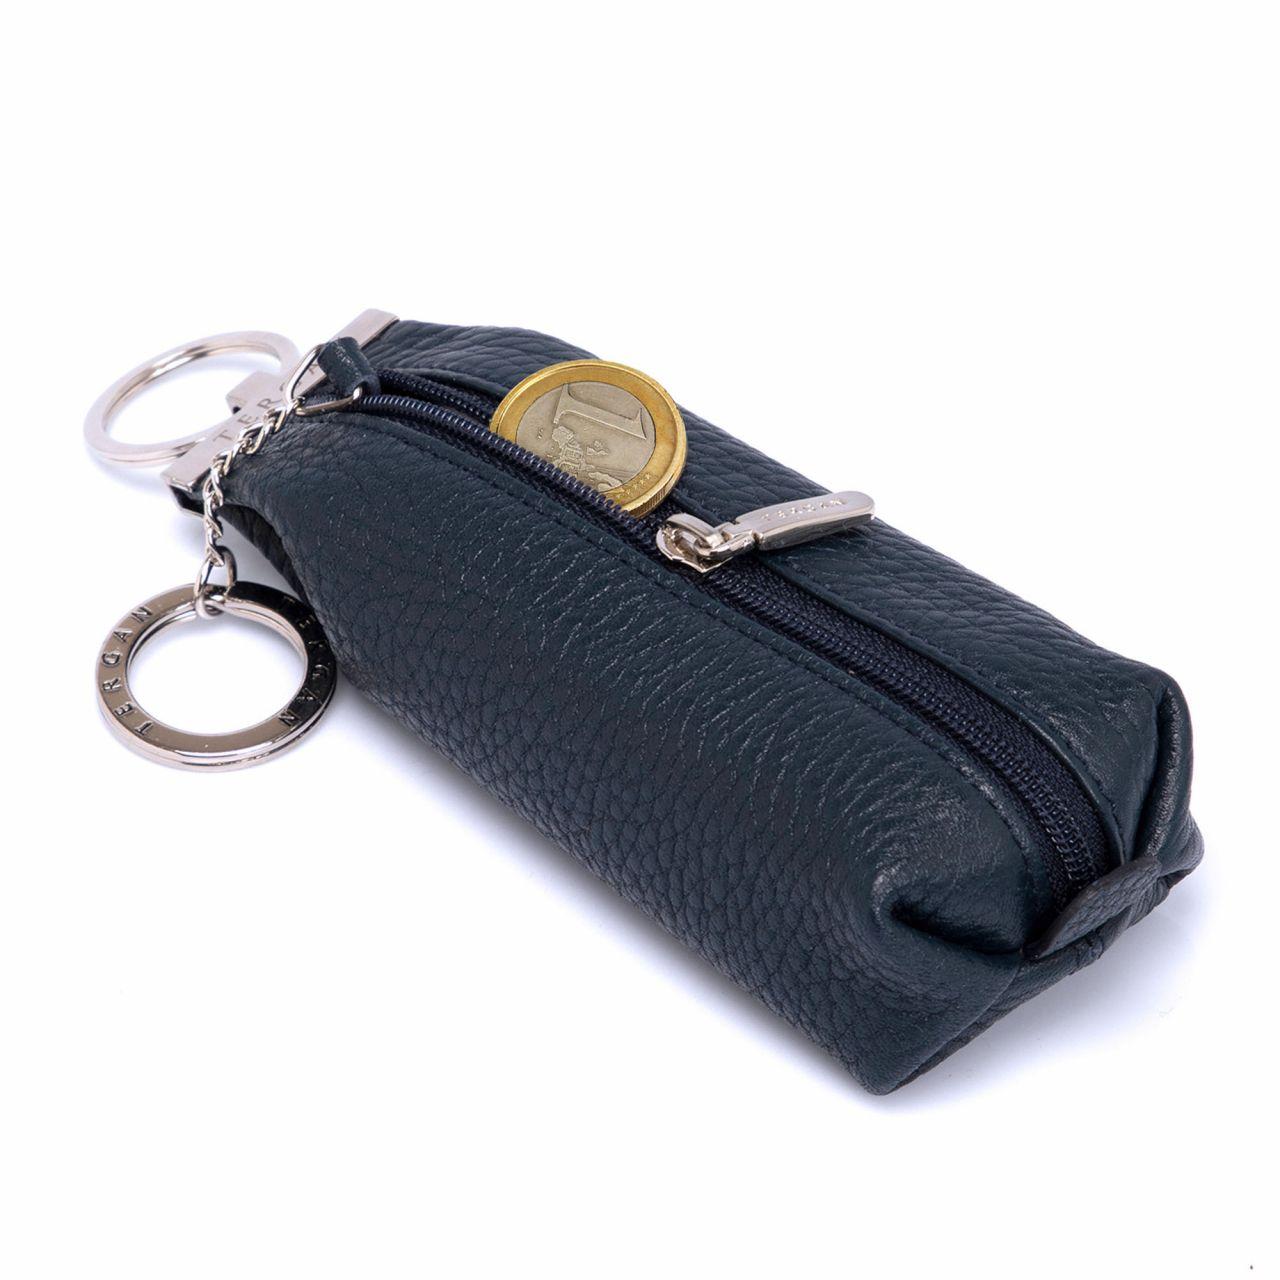 Leather Key Organiser